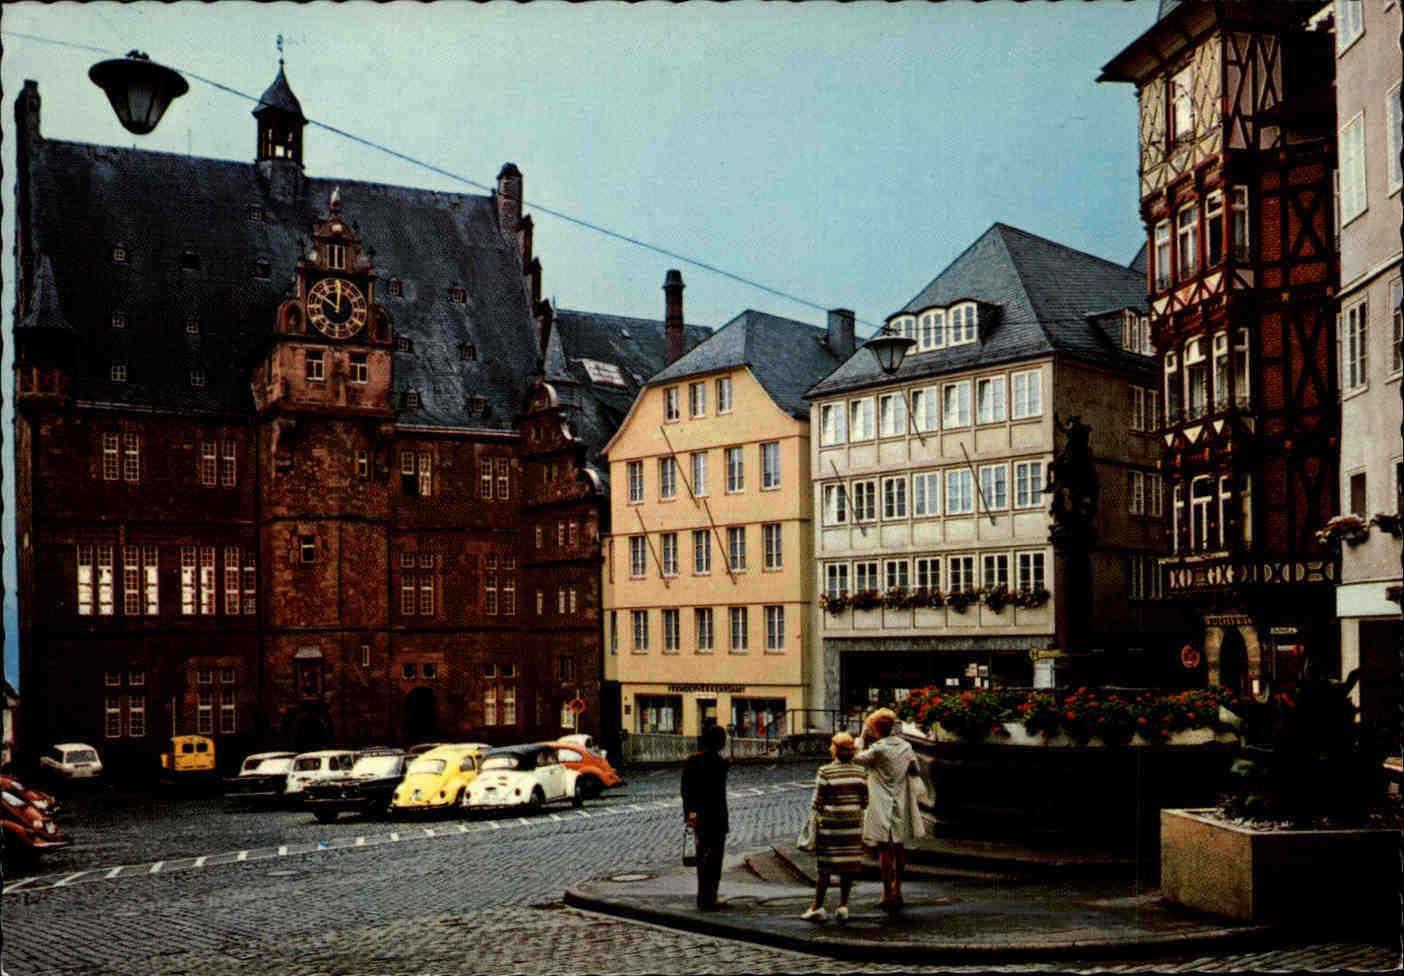 Convertible in Marburg